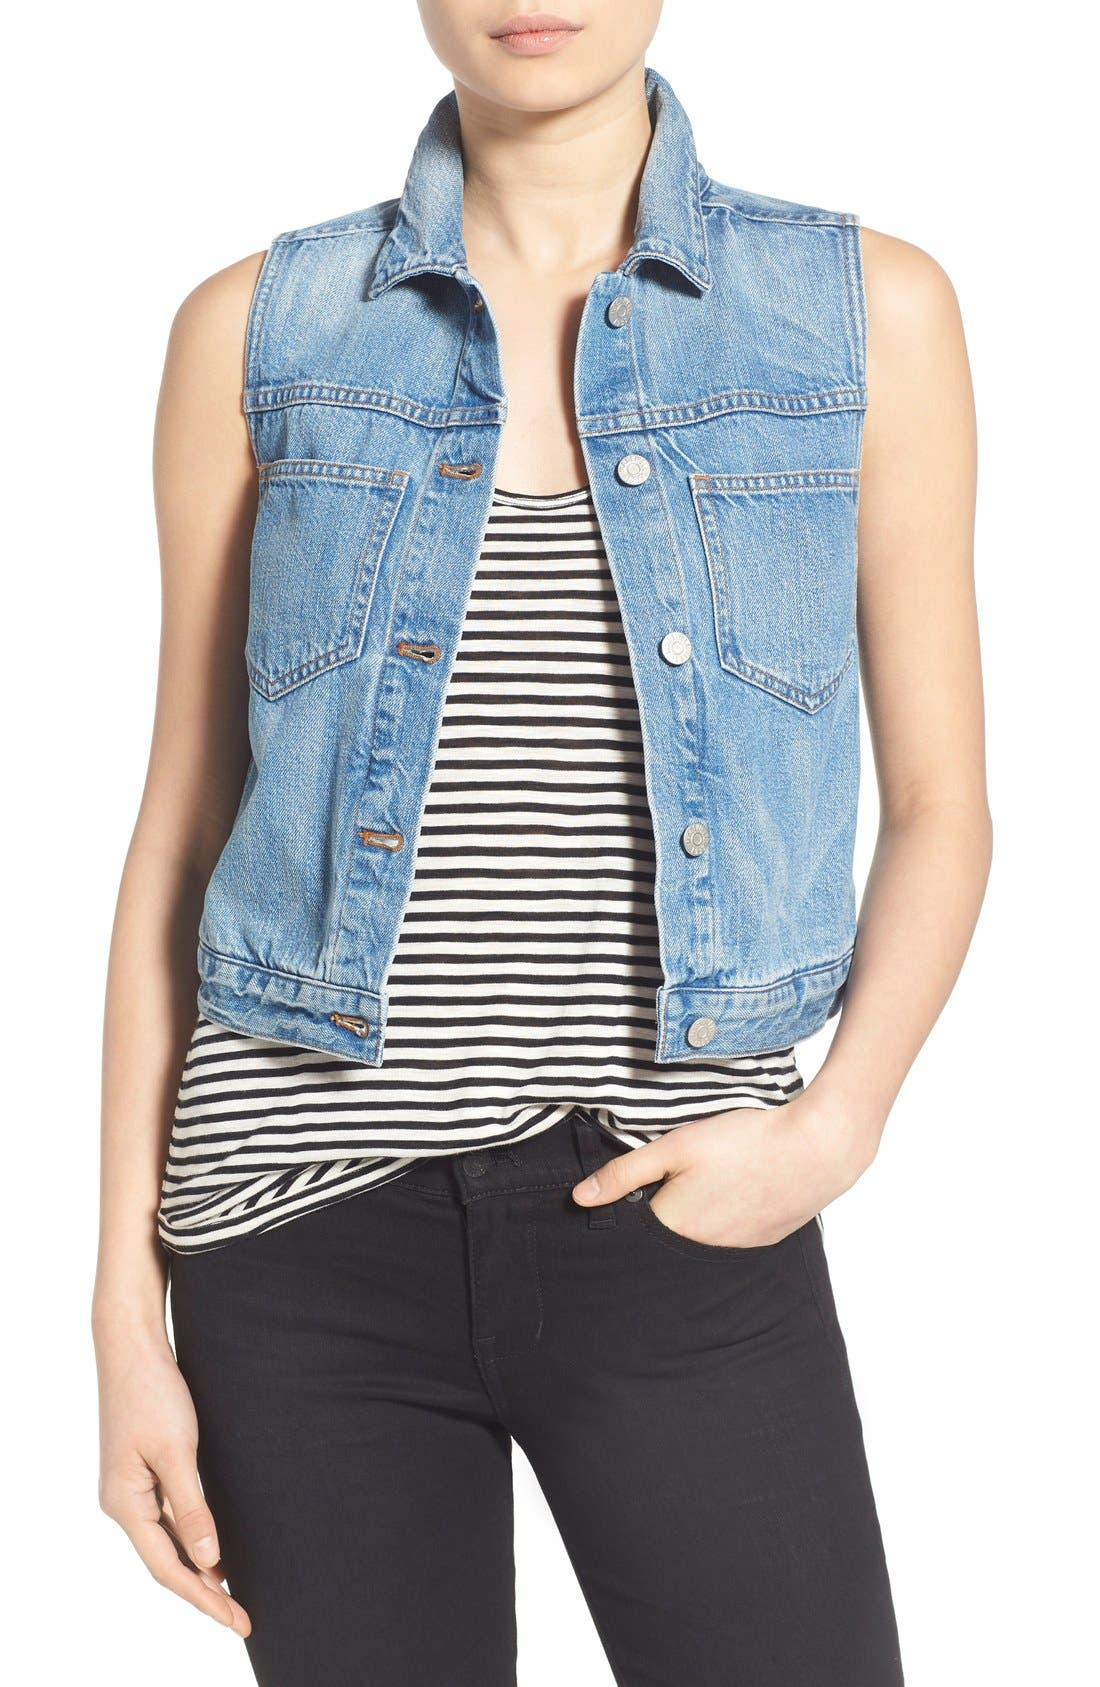 MADEWELL Chest Pocket Denim Vest, Main, color, 400